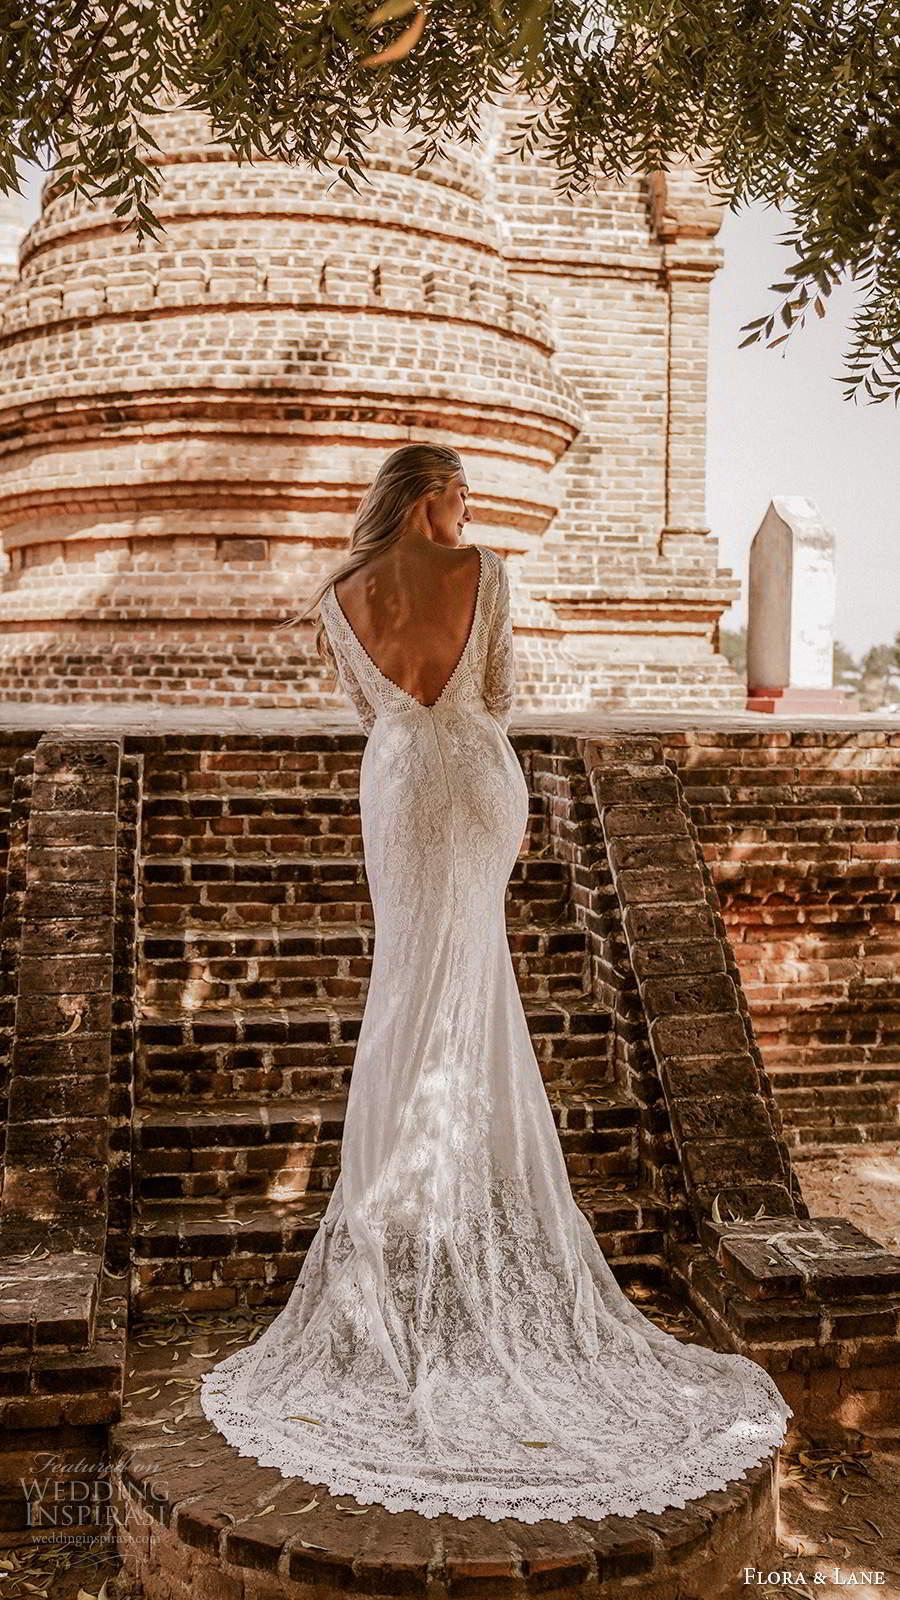 flora and lane 2019 bridal long sleeves bateau neckline fully embellished lace boho romantic mermaid sheath wedding dress v back chapel train (5) bv